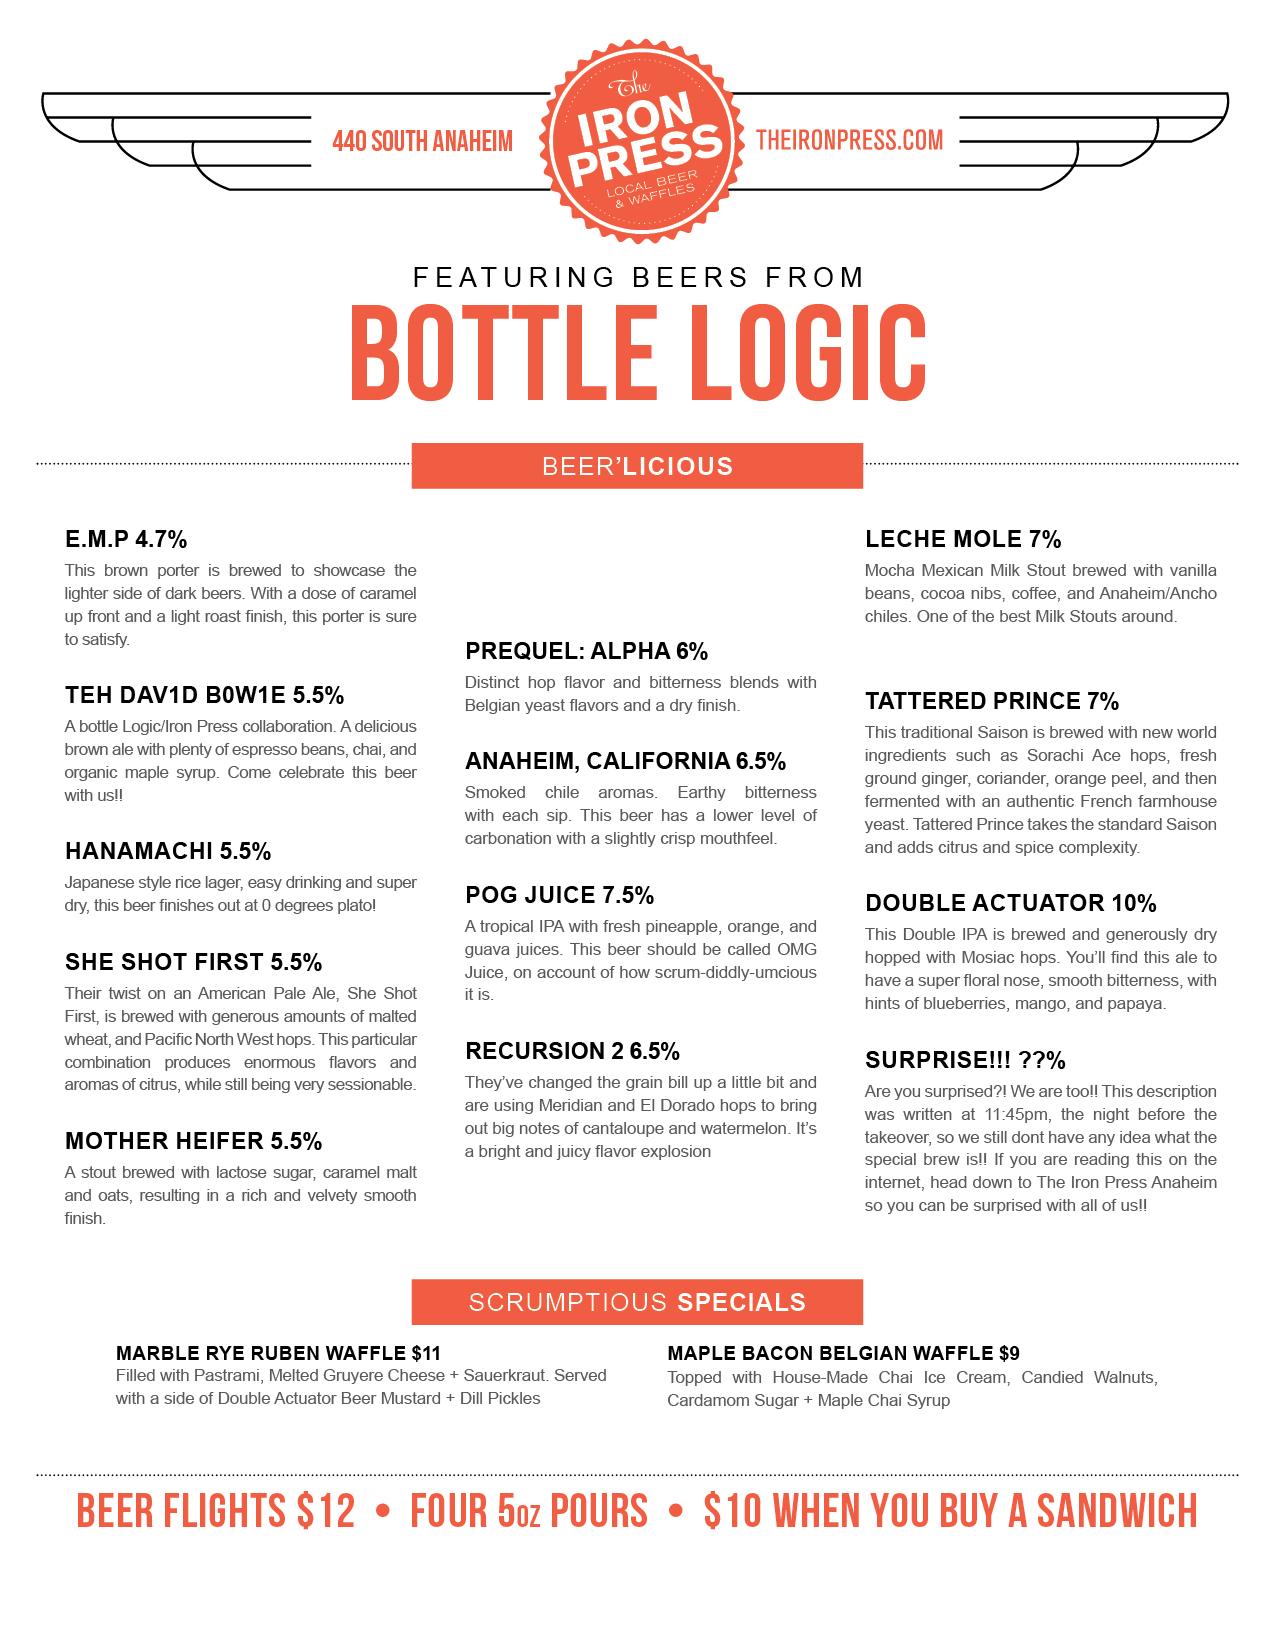 Bottle Logic Brewing x The Iron Press